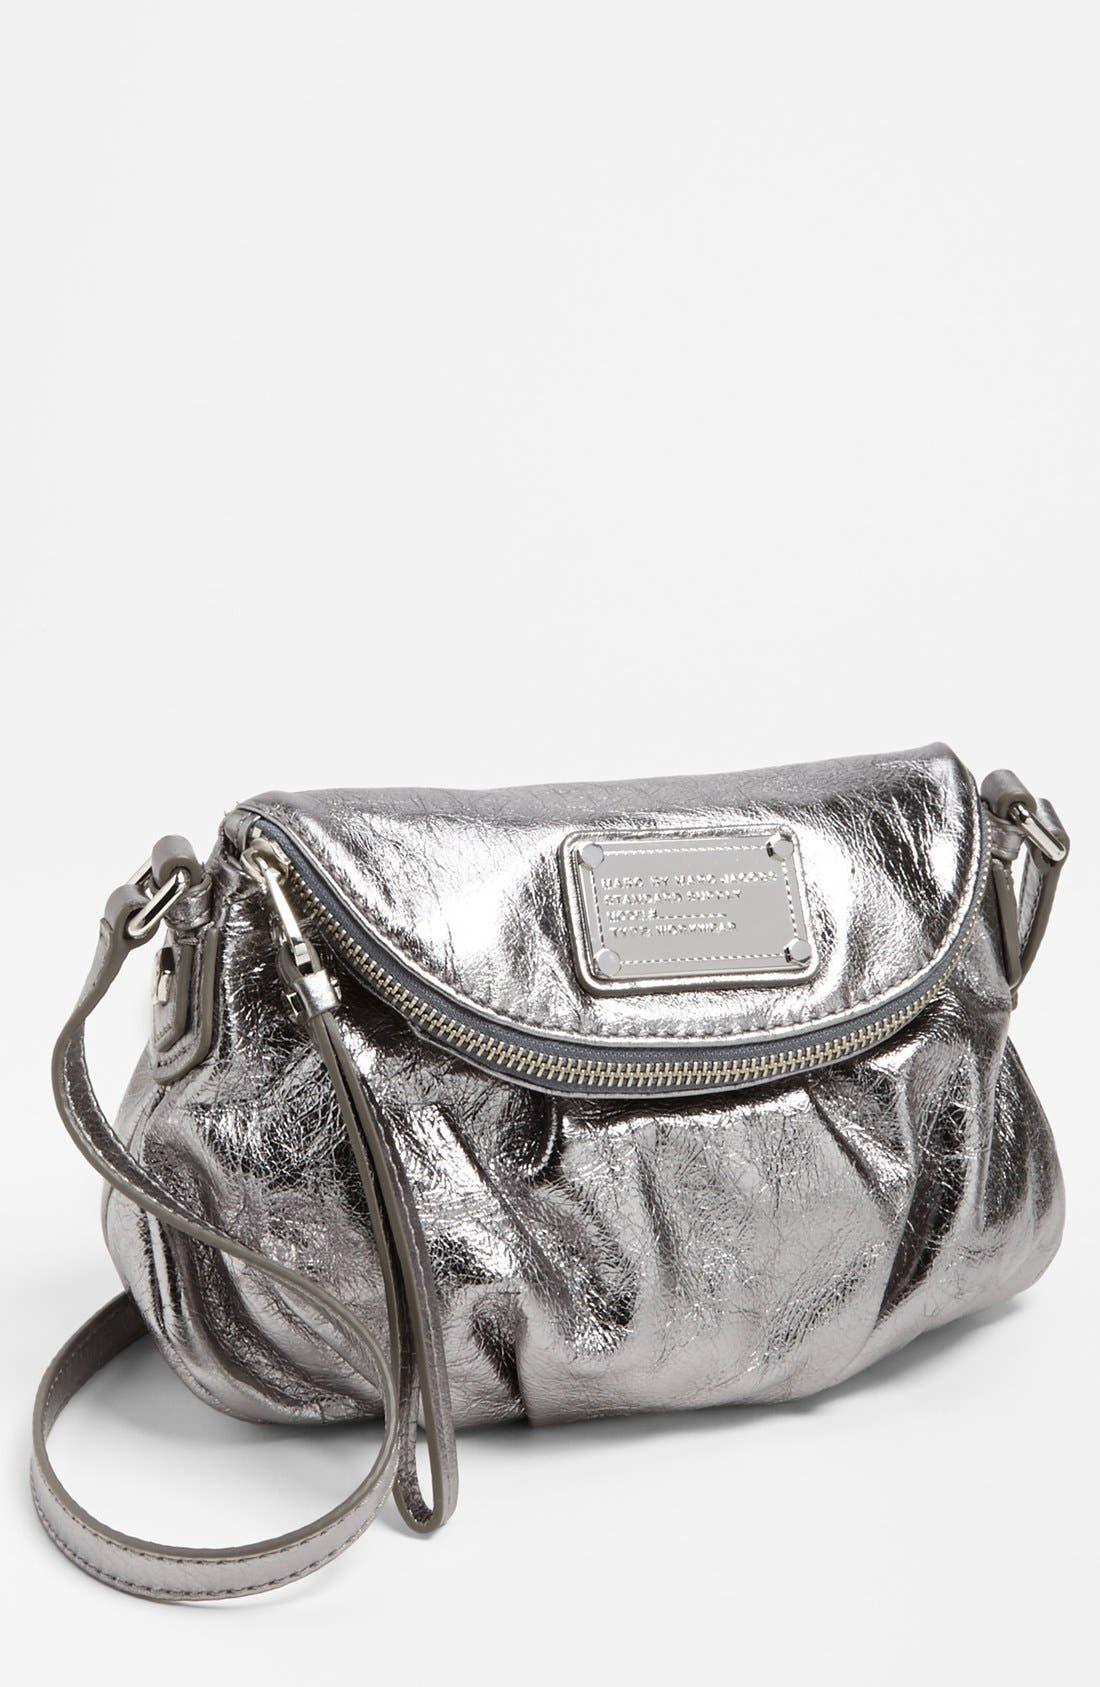 Main Image - MARC BY MARC JACOBS 'Classic Q Natasha - Mini' Crossbody Flap Bag